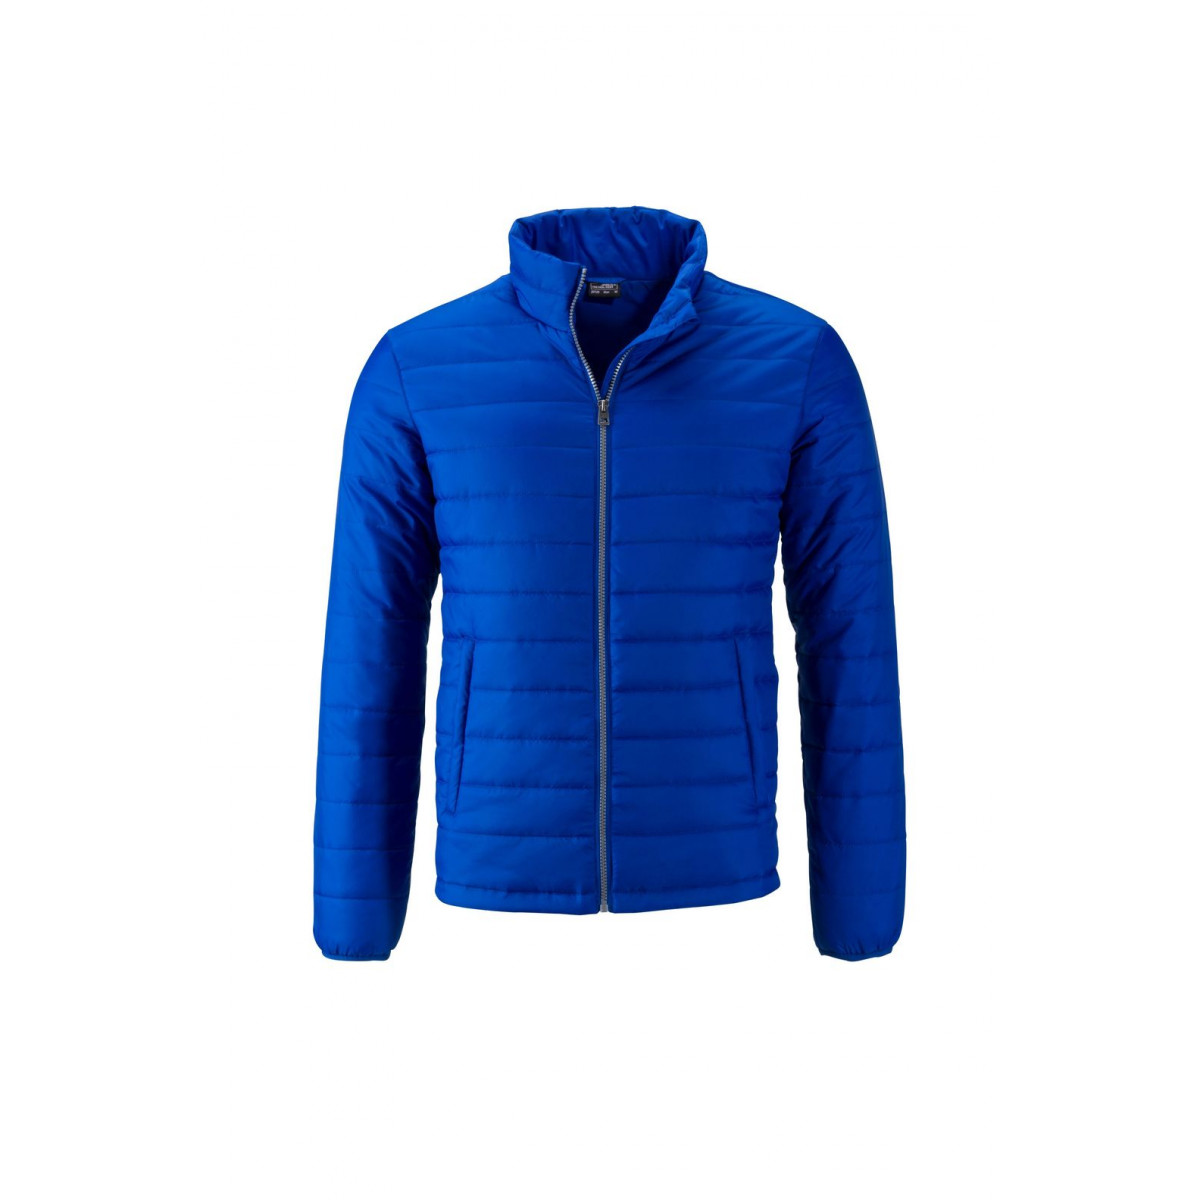 Куртка мужская JN1120 Mens Padded Jacket - Ярко-синий